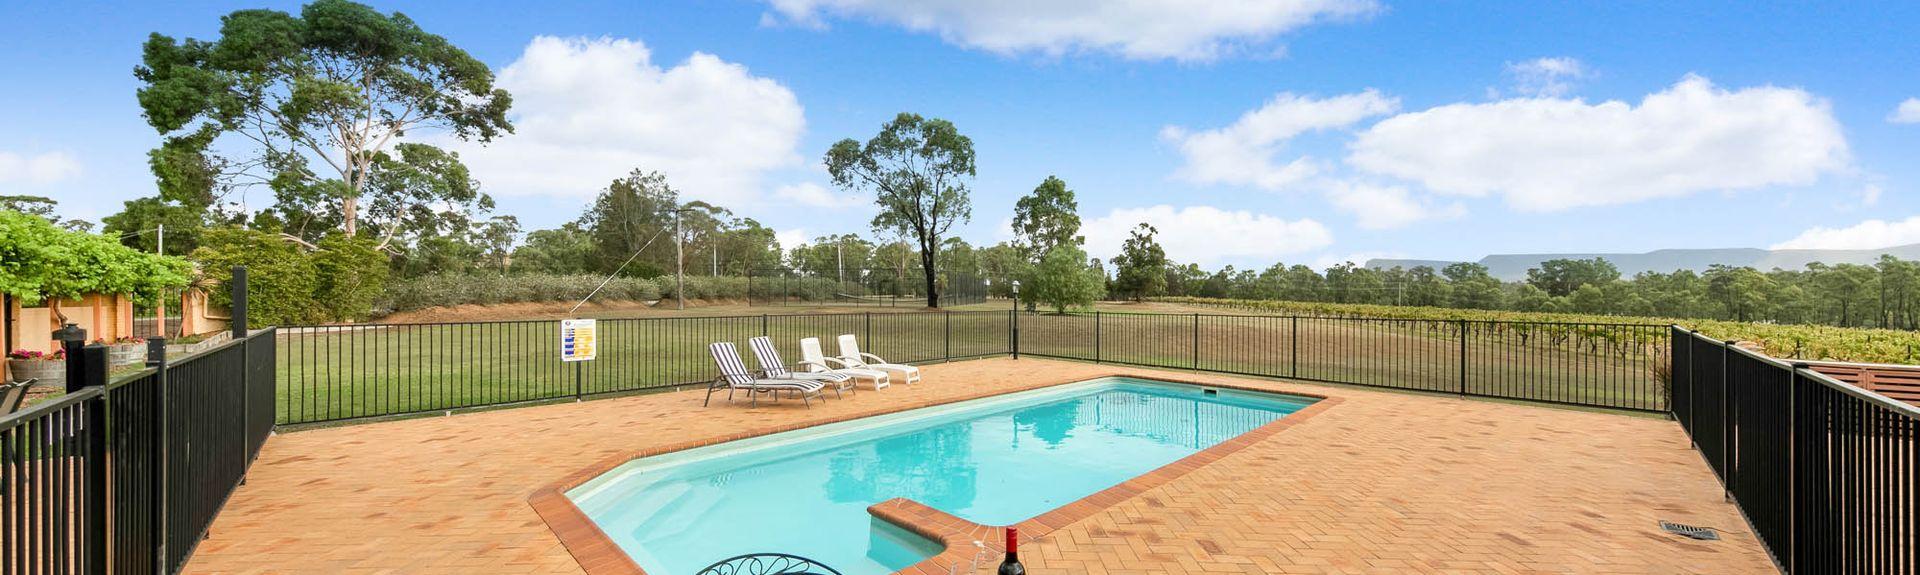 Bimbadgen Estate, Pokolbin, New South Wales, Australia